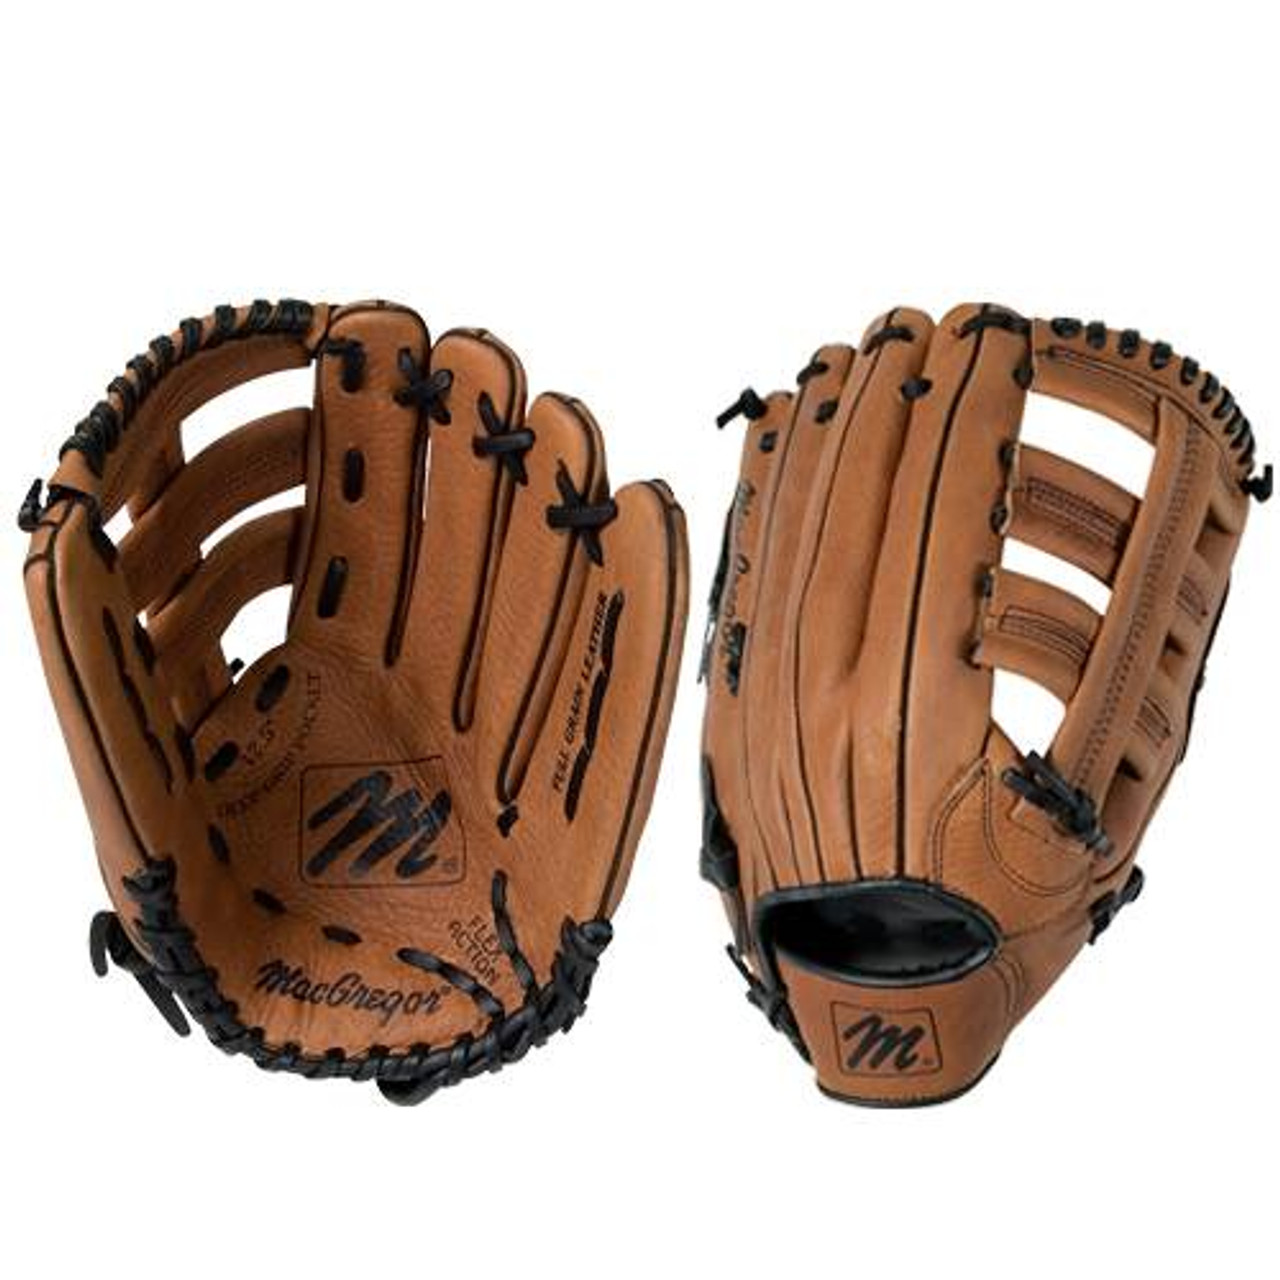 MacGregor Varsity 12.5 Baseball Fielder's Glove